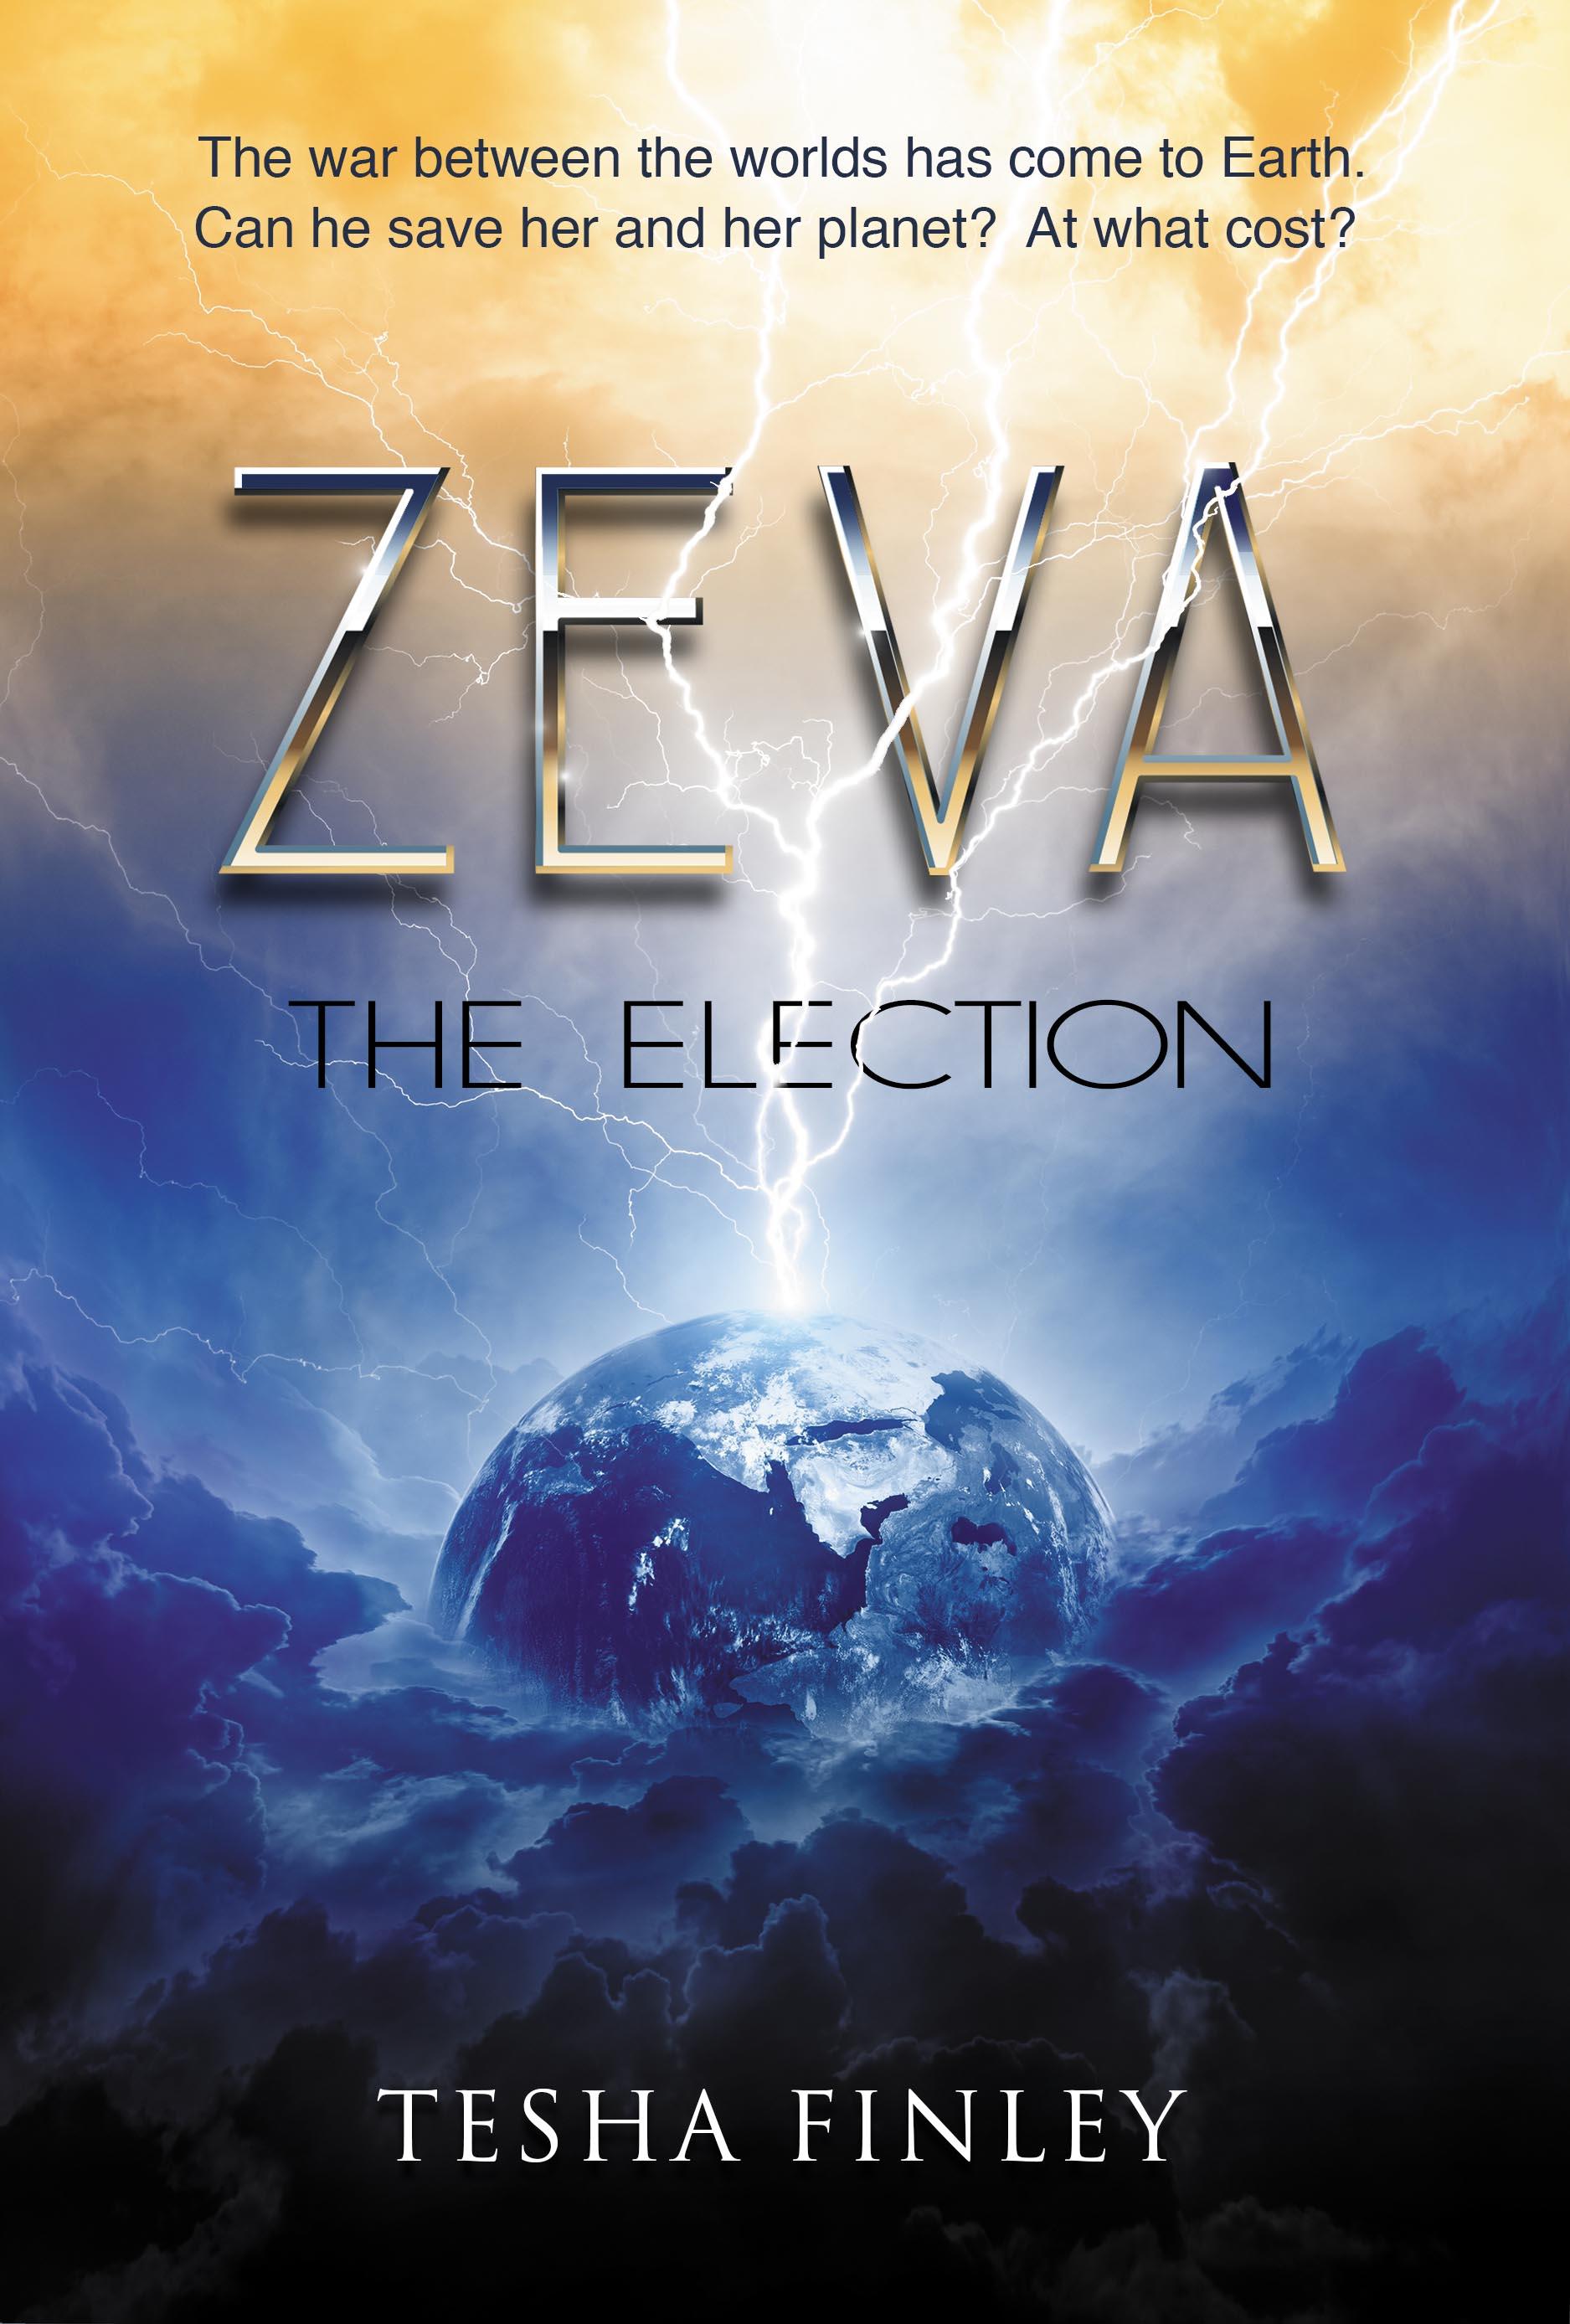 Tesha Finley's new book, Zeva: The Election, receives rave reviews